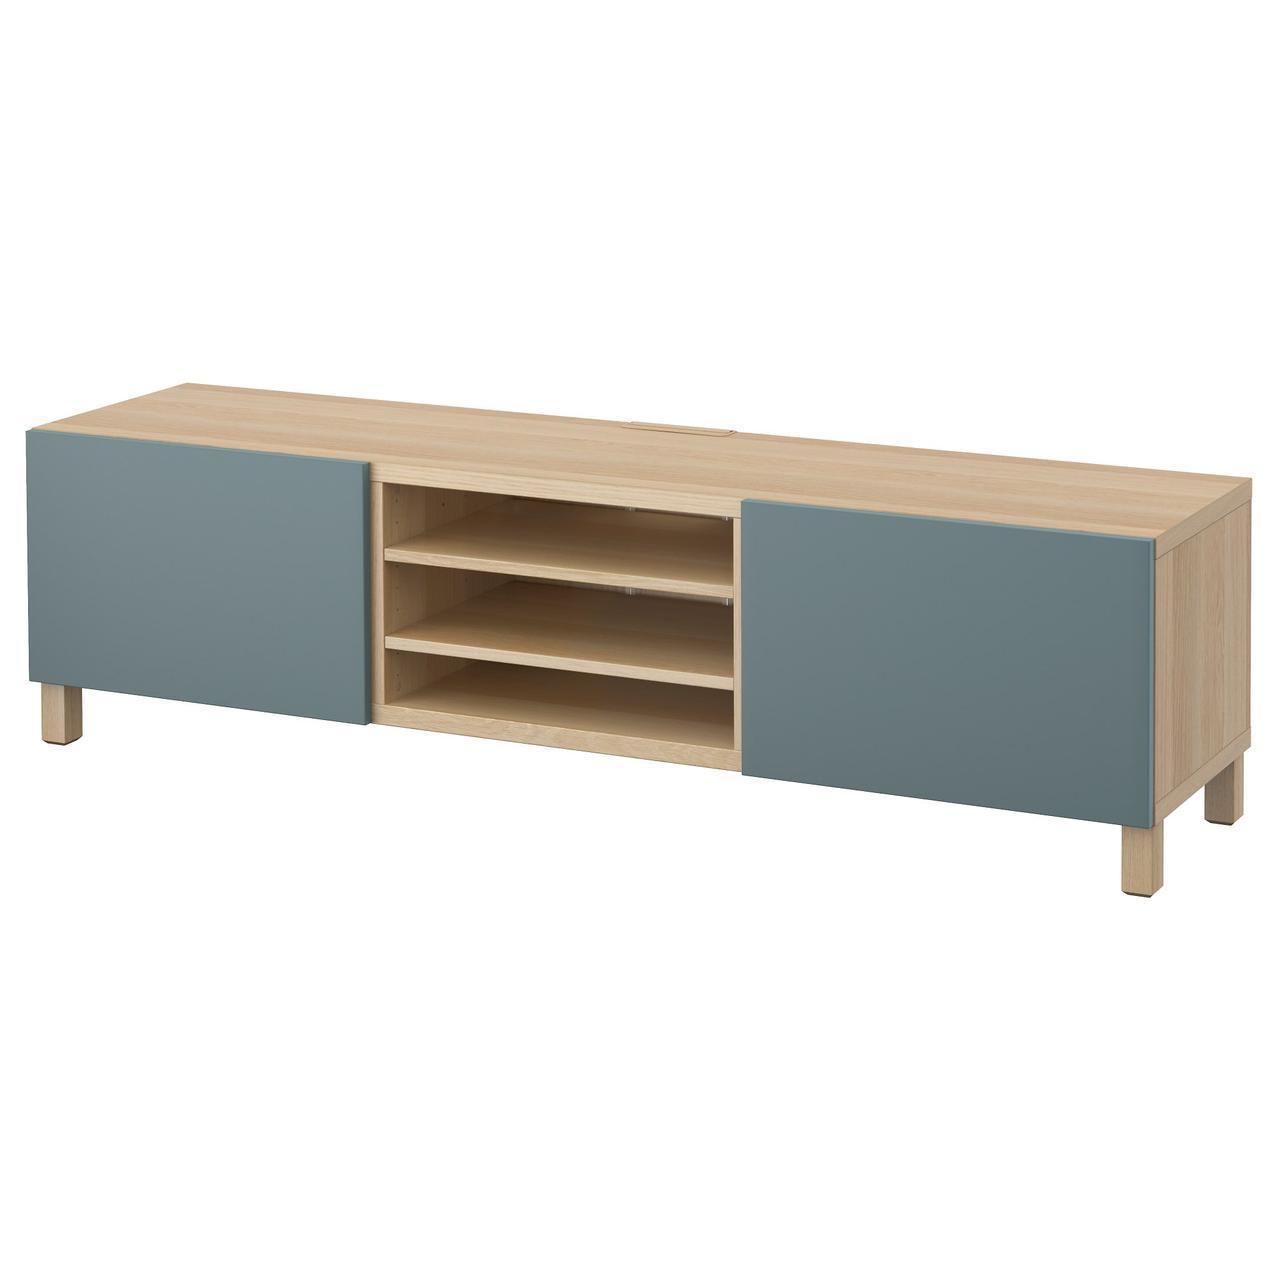 IKEA BESTA Тумба под телевизор с ящиками, белый дуб, Вальвикен сзаротуркусови  (391.886.28)